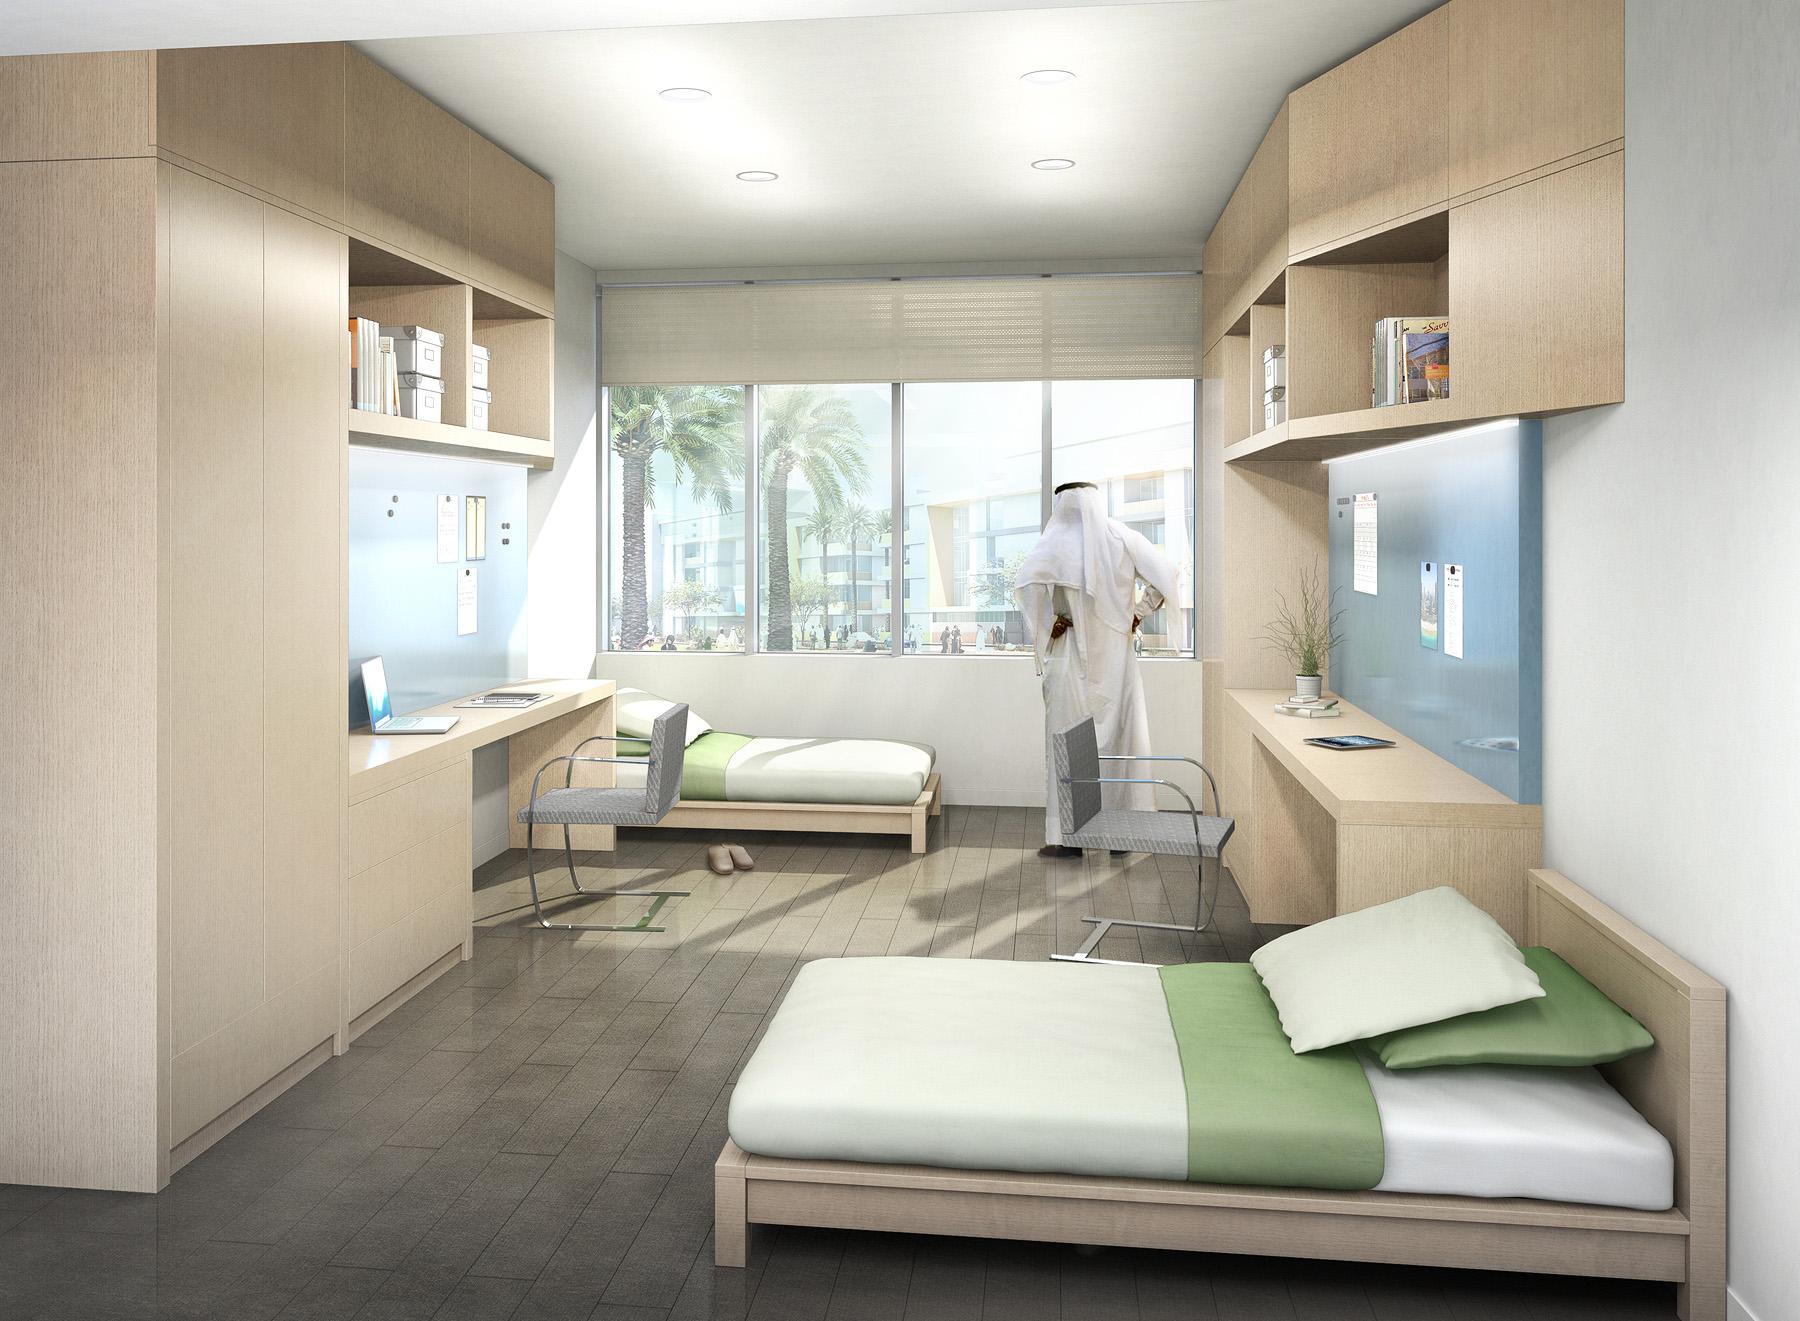 Abu Dhabi National Oil Company  Abu Dhabi, UAE |  Client: HOK Architecture